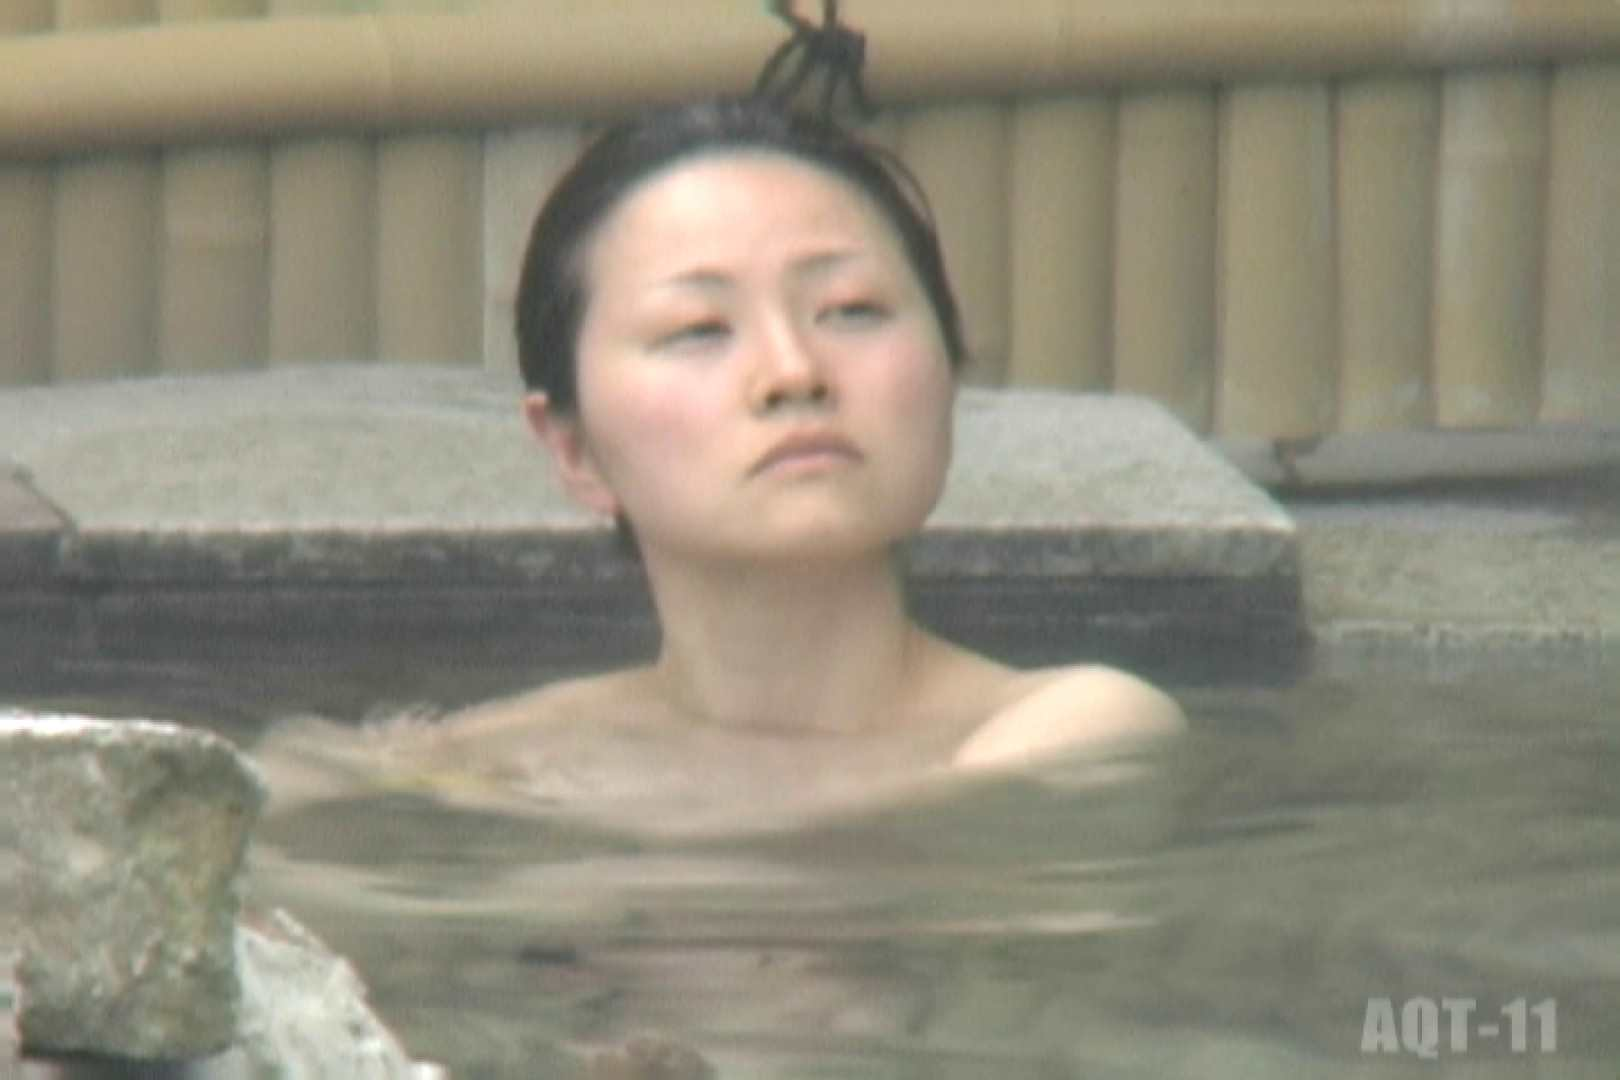 Aquaな露天風呂Vol.802 女体盗撮 盗み撮りSEX無修正画像 85連発 59